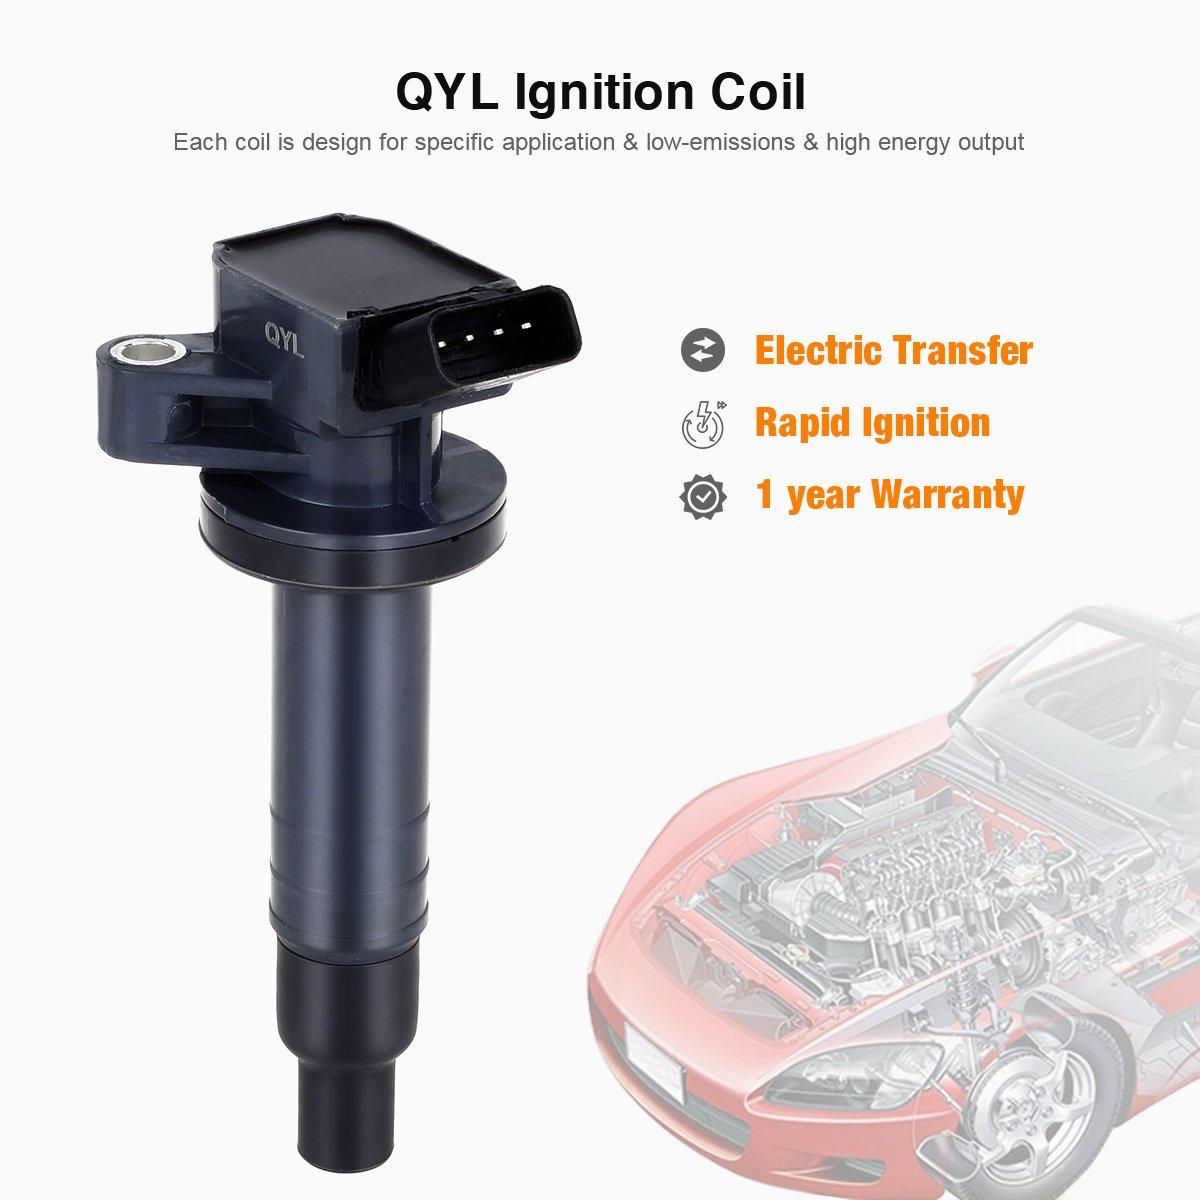 4Pcs Ignition Coil Pack Fits Toyota Celica GT Corolla Matrix MR2 Pontiac Vibe Chevy Prizm L4 1.8L 1ZZFE UF247 9091902239 C1249 UF-315